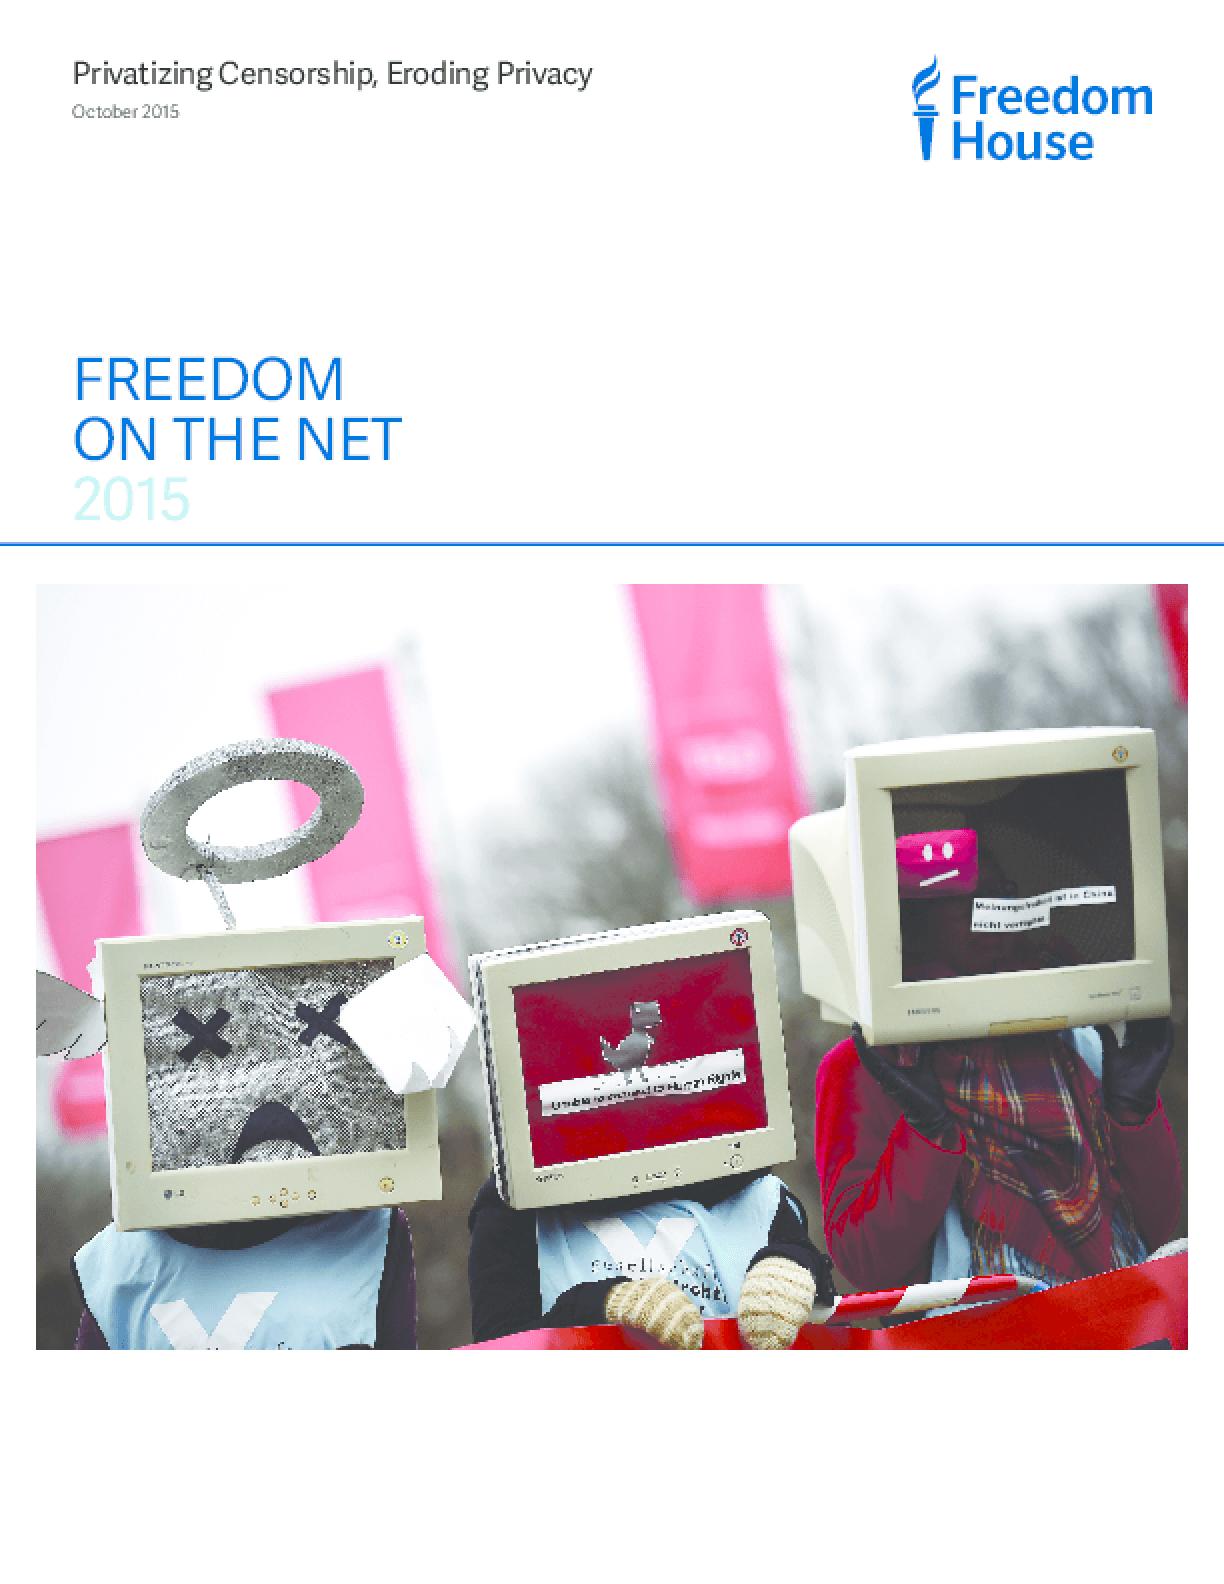 Freedom on the Net 2015: Privatizing Censorship, Eroding Privacy (Summary)